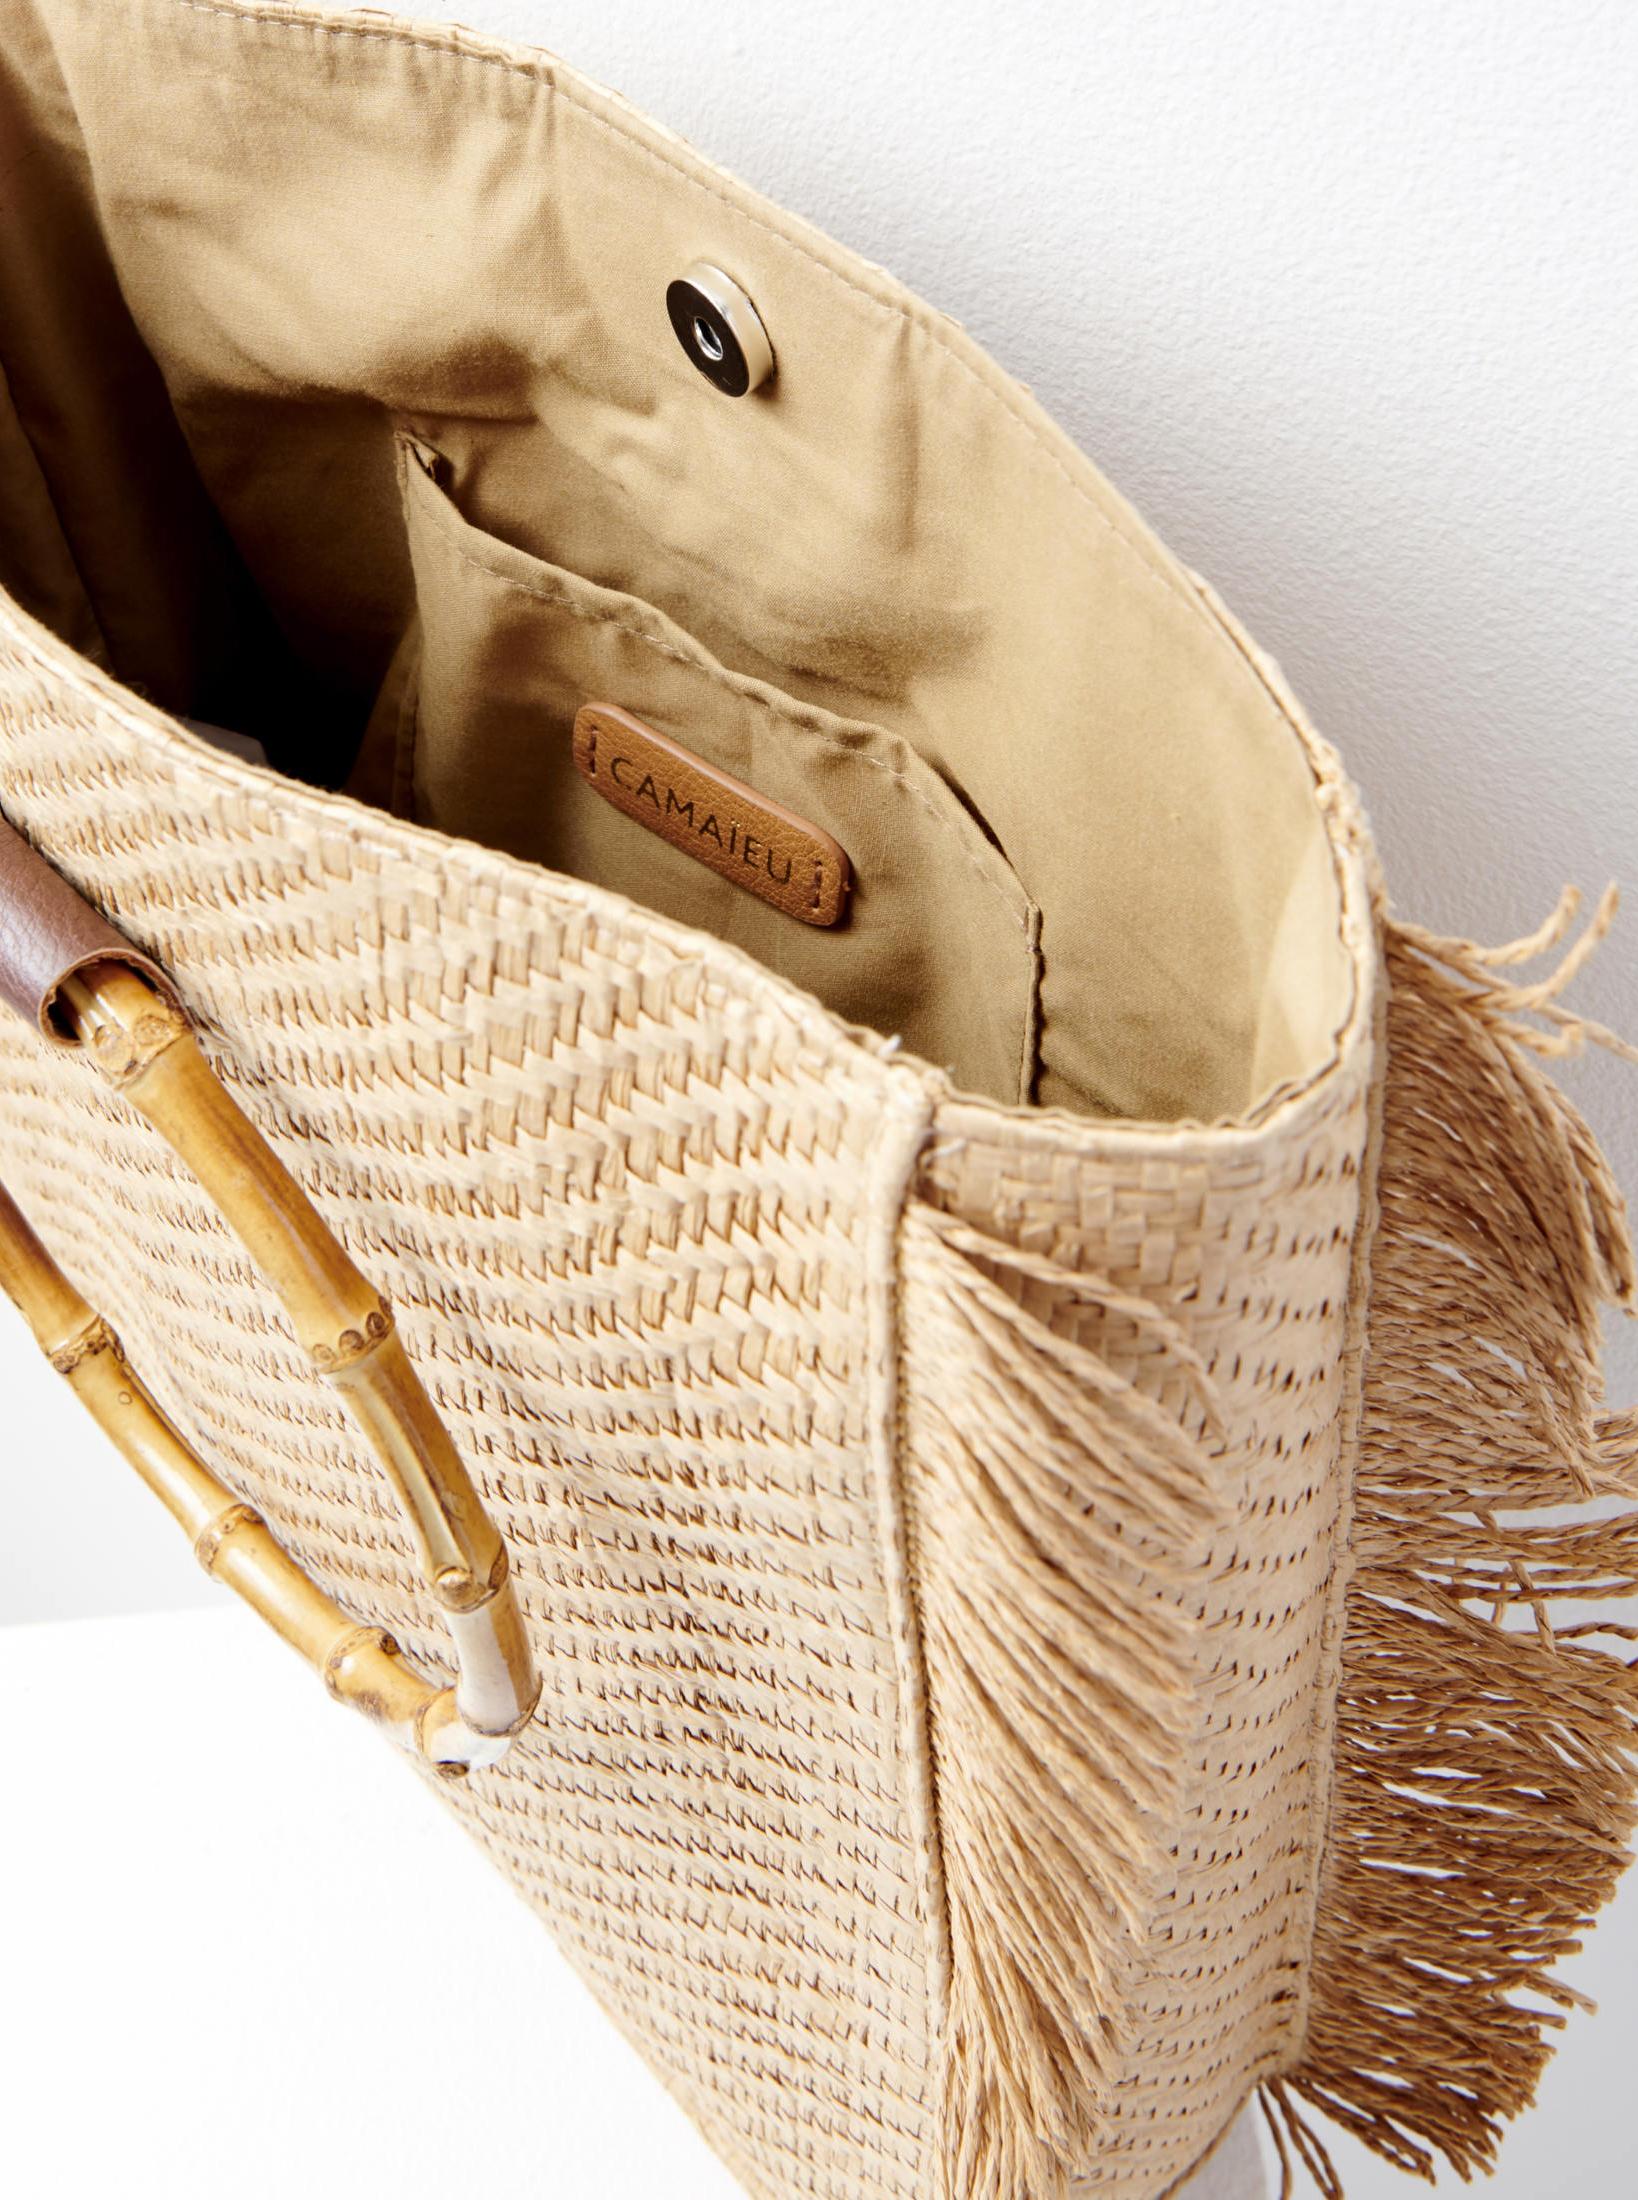 CAMAIEU Women's bag beige